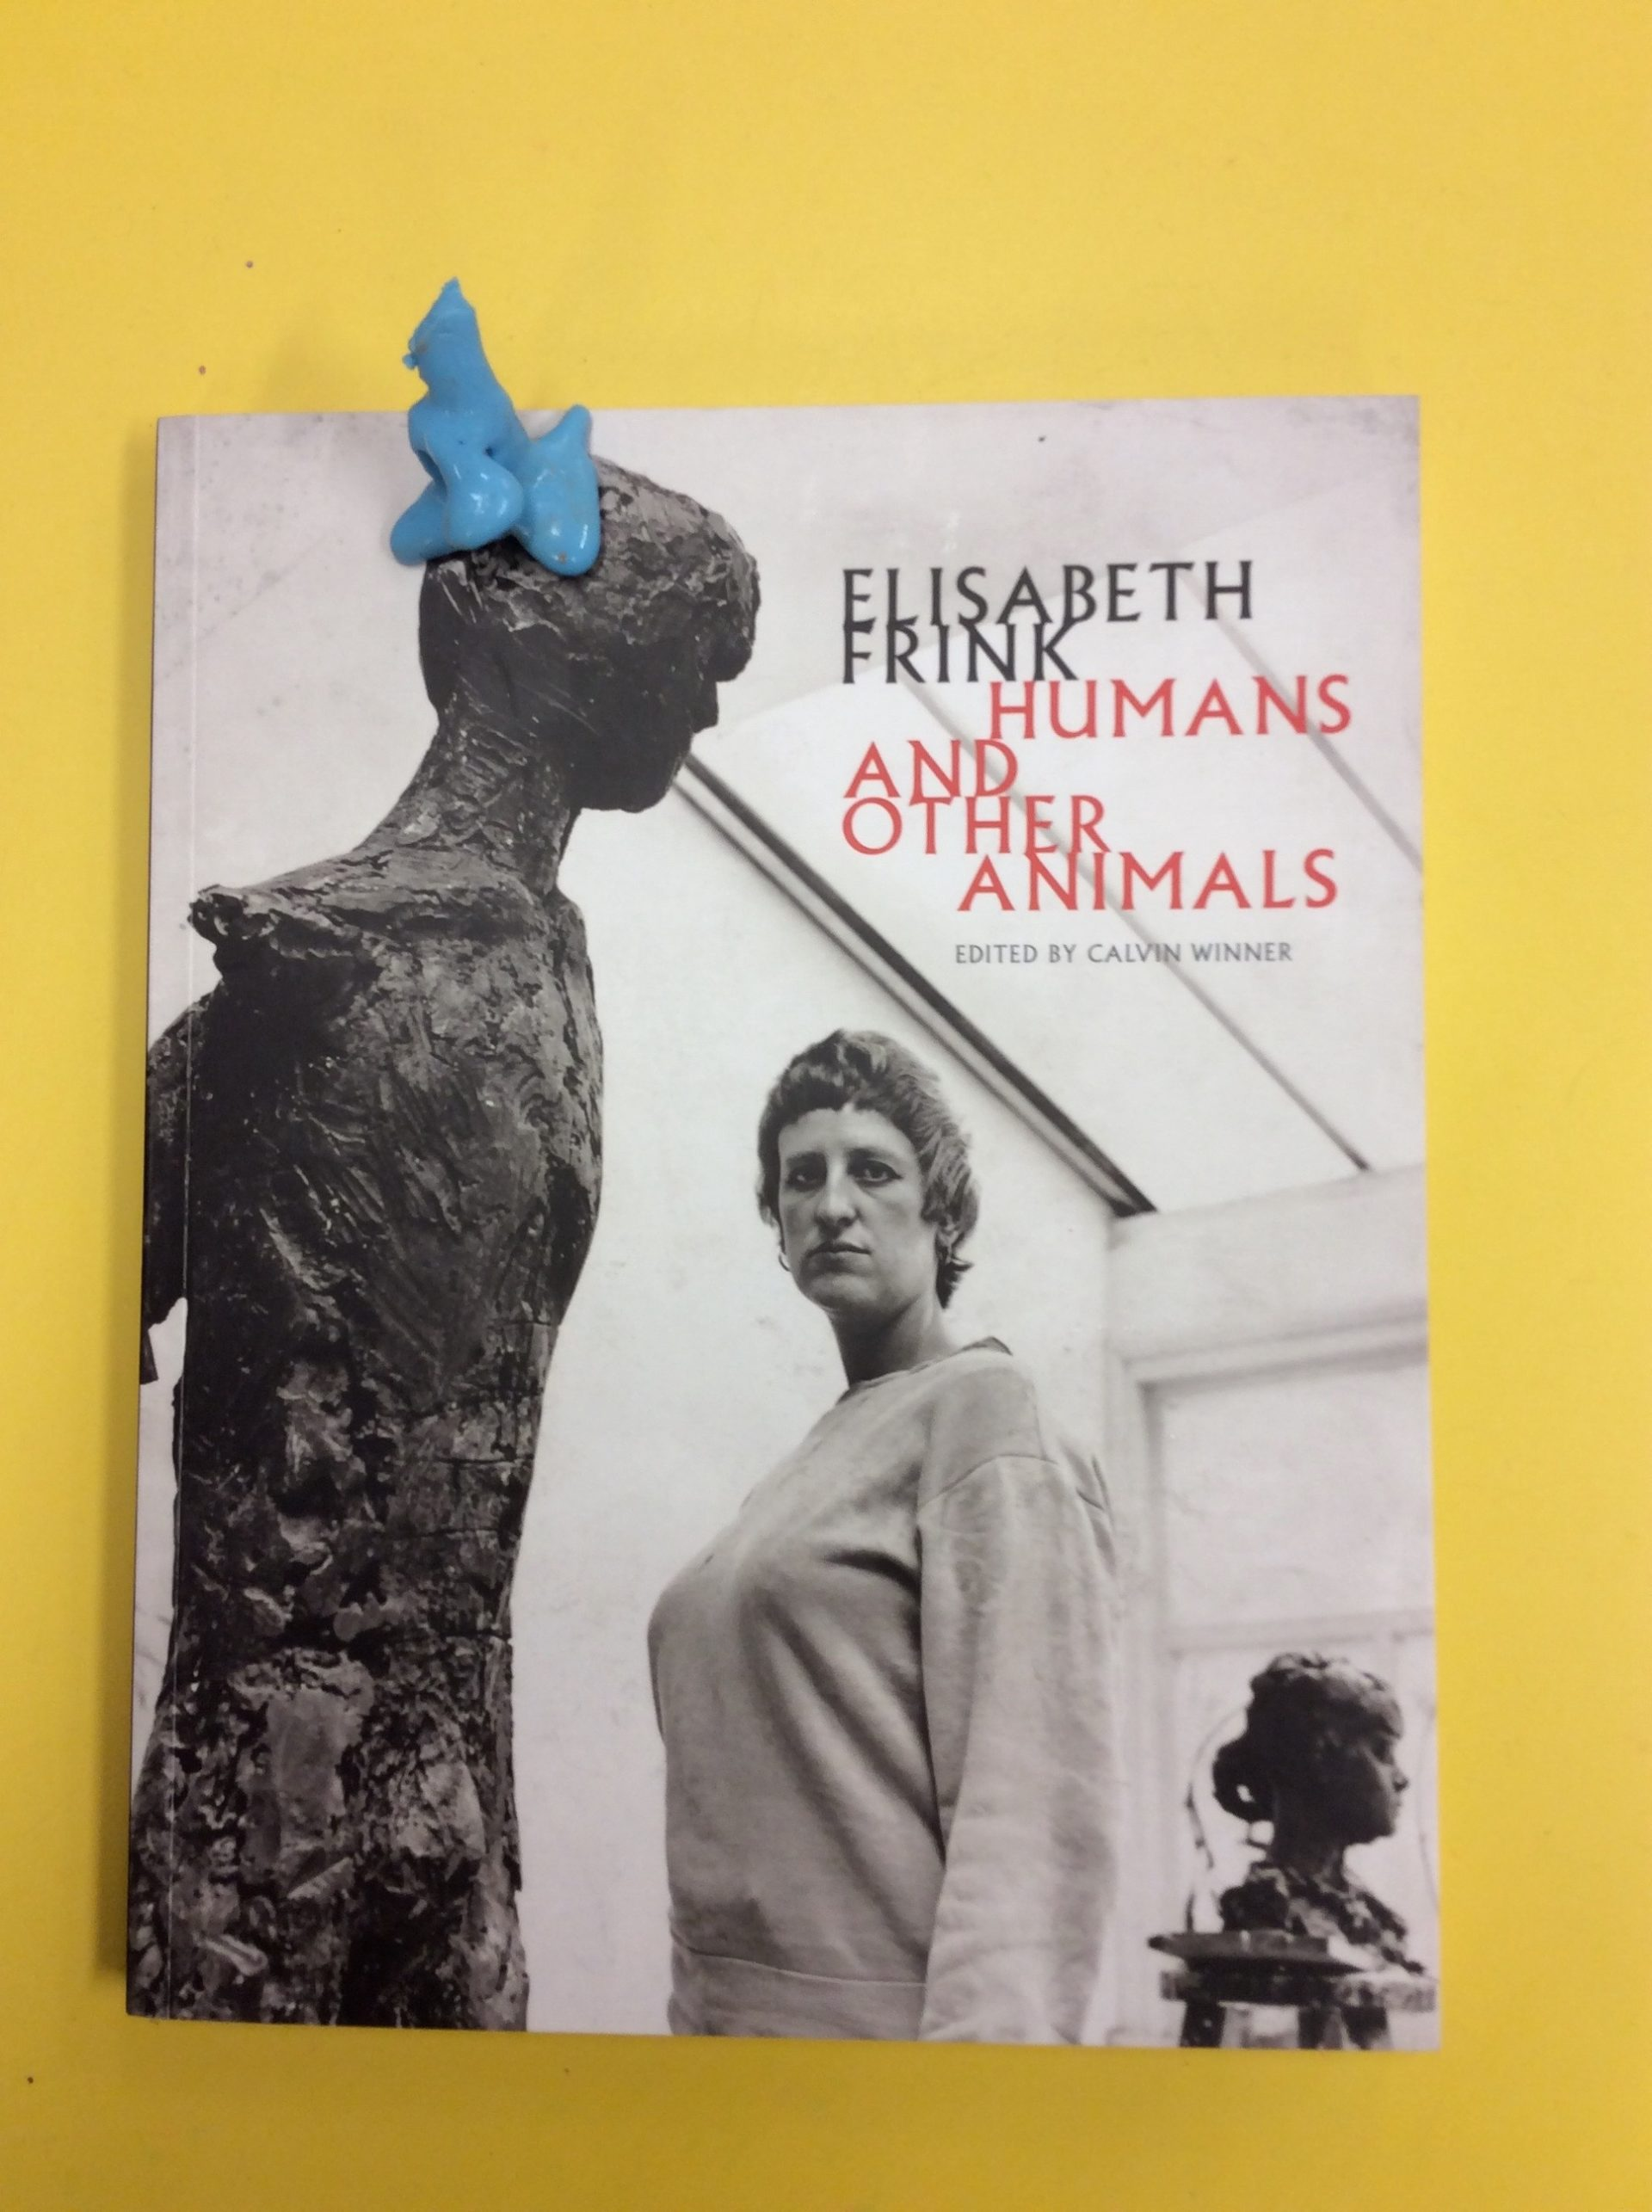 Elisabeth Frink book cover, blue blob, yellow